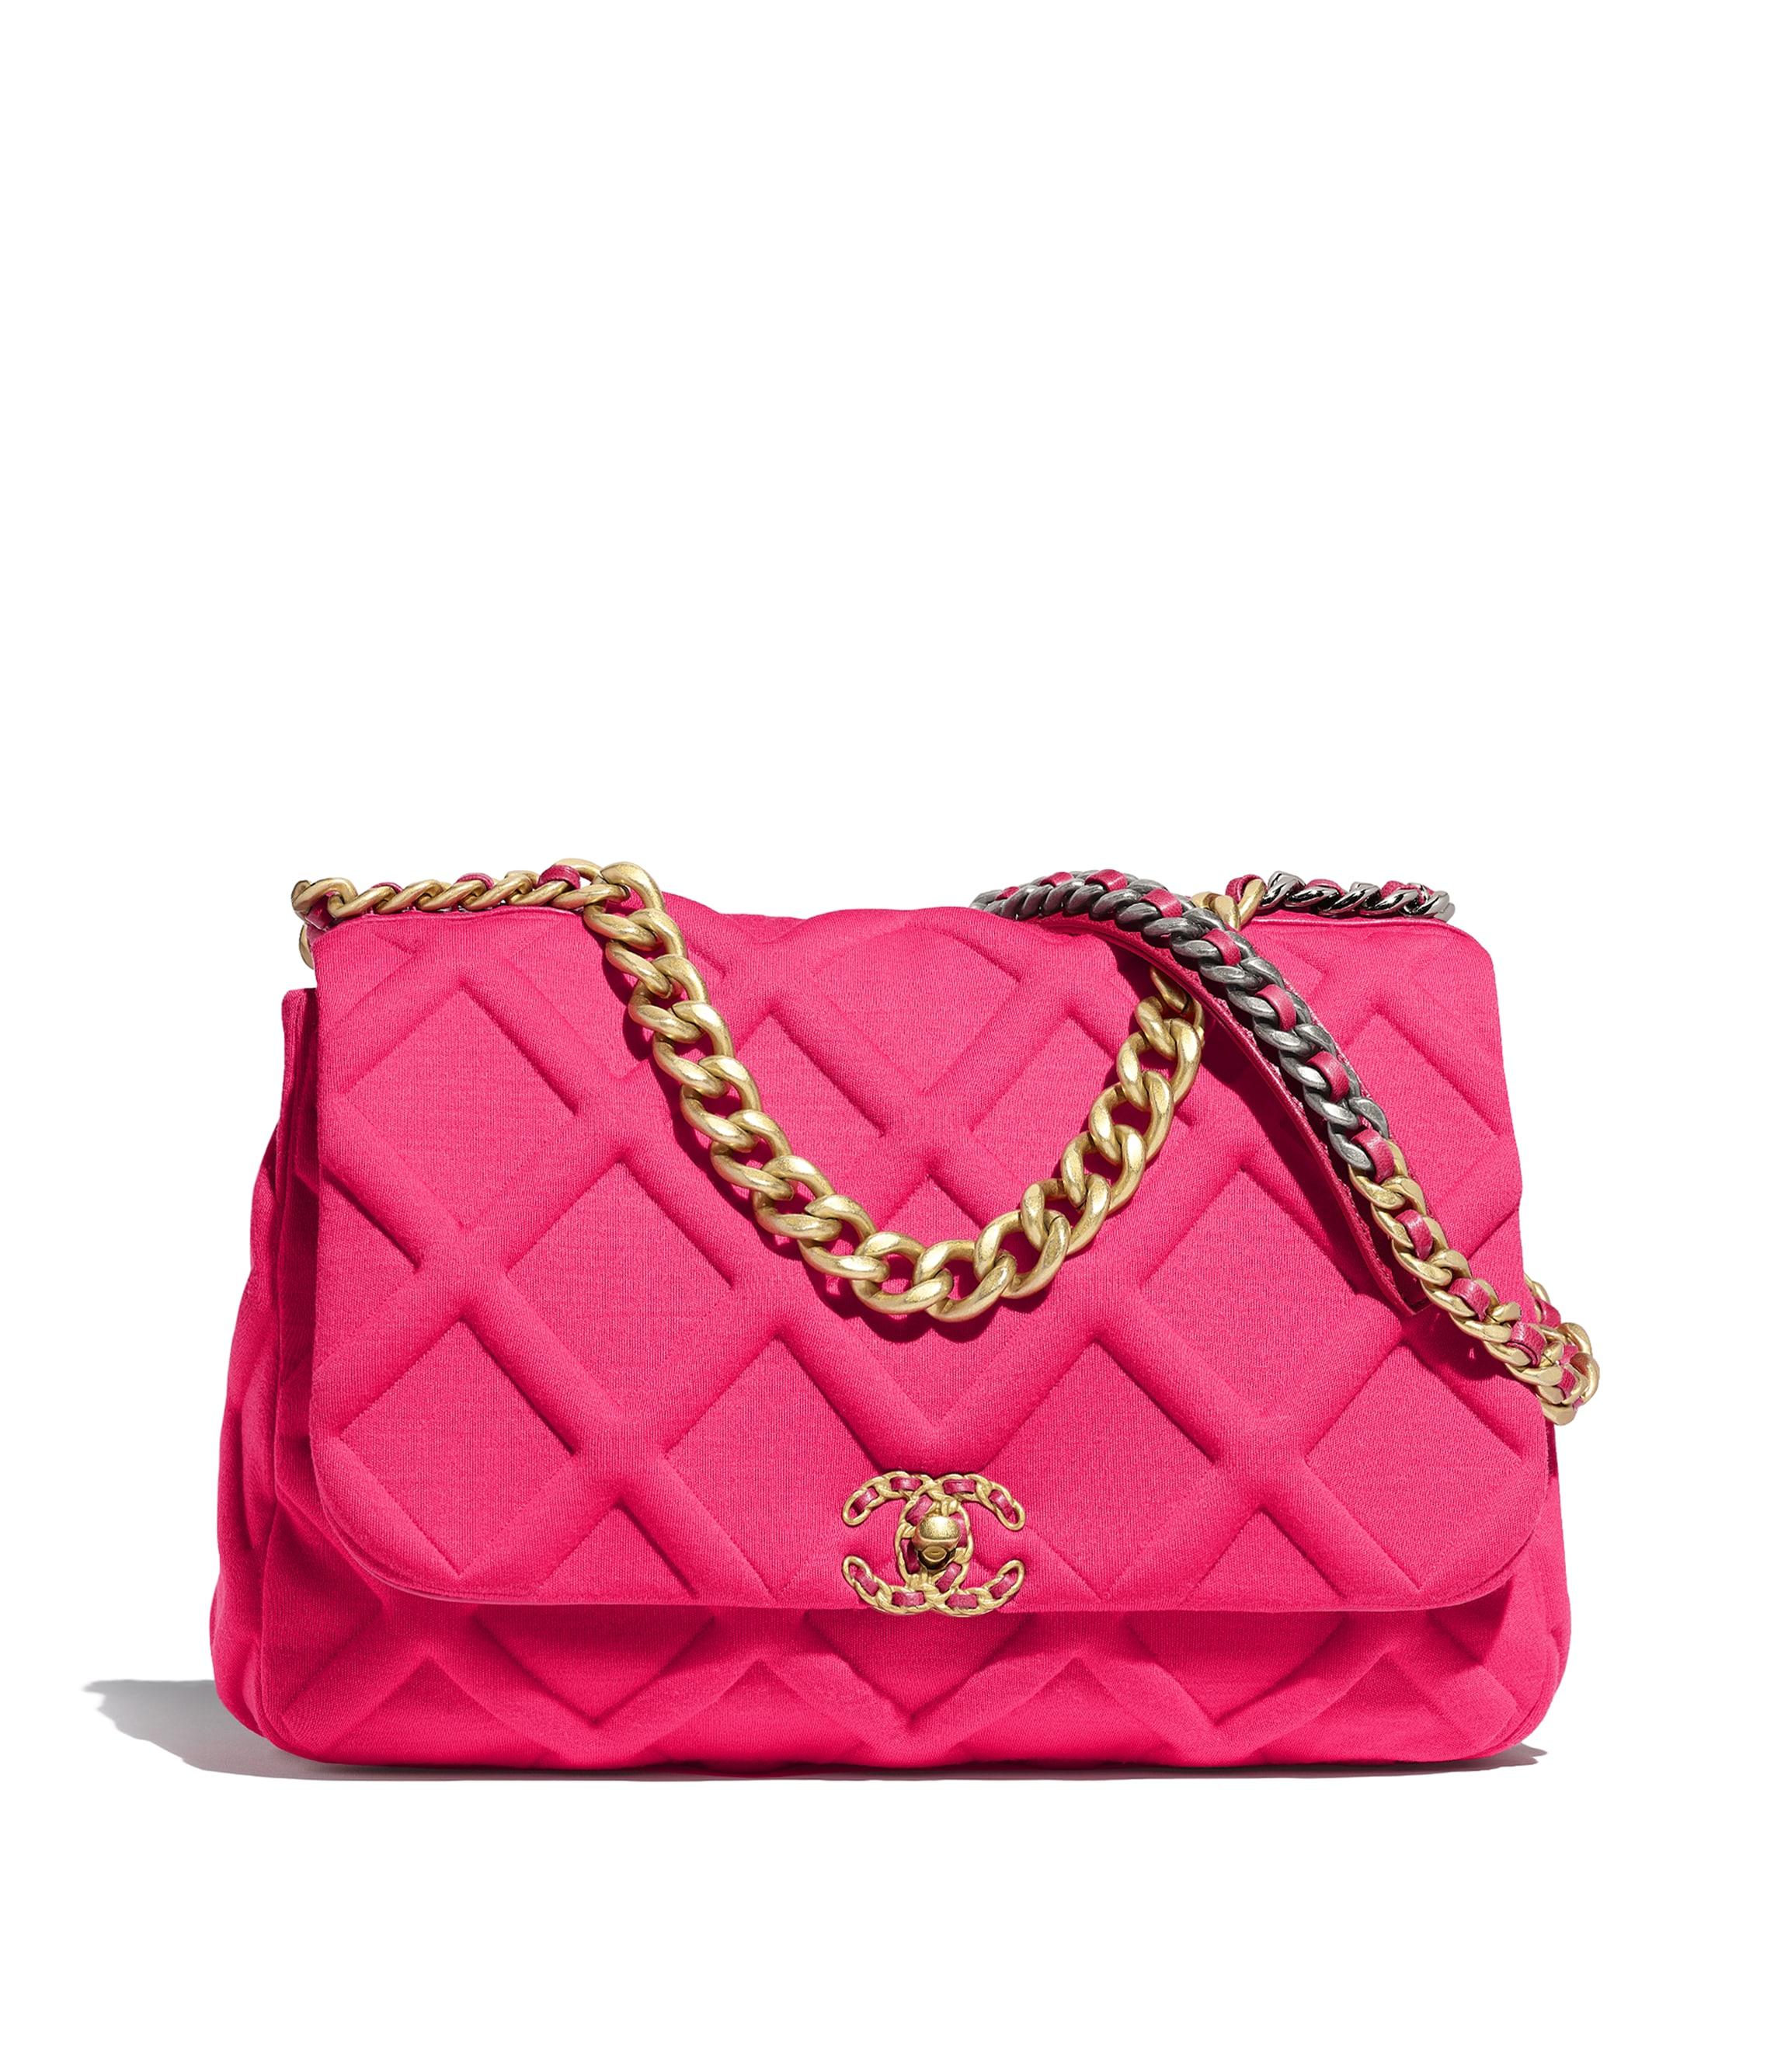 Handbags Chanel